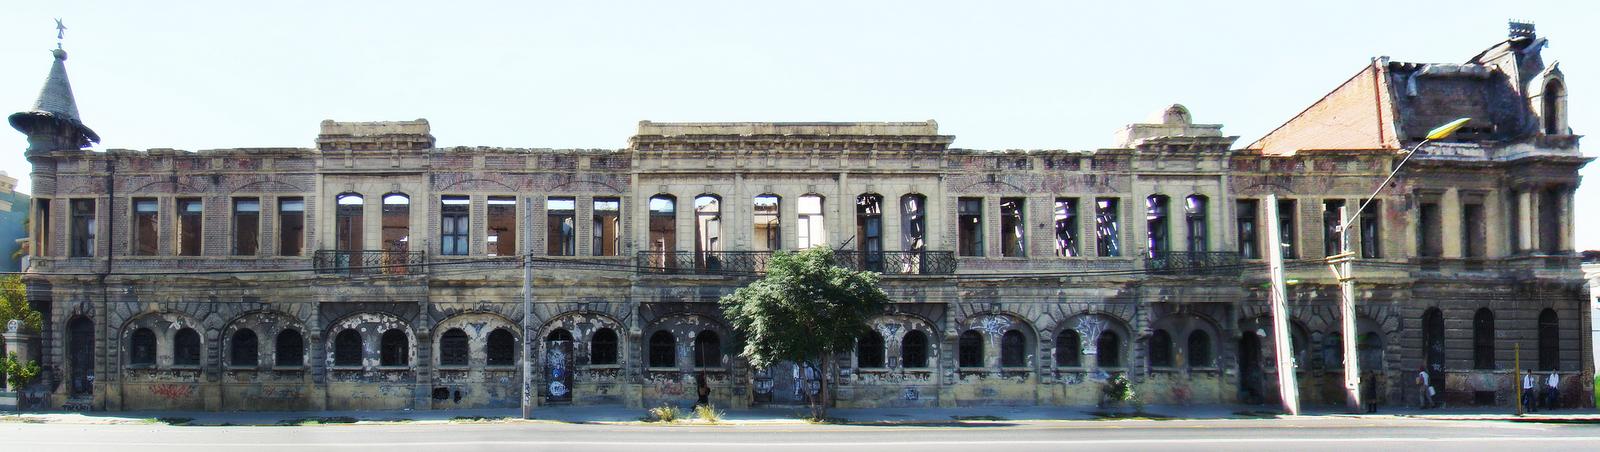 fachada_fabrica_ebner.png